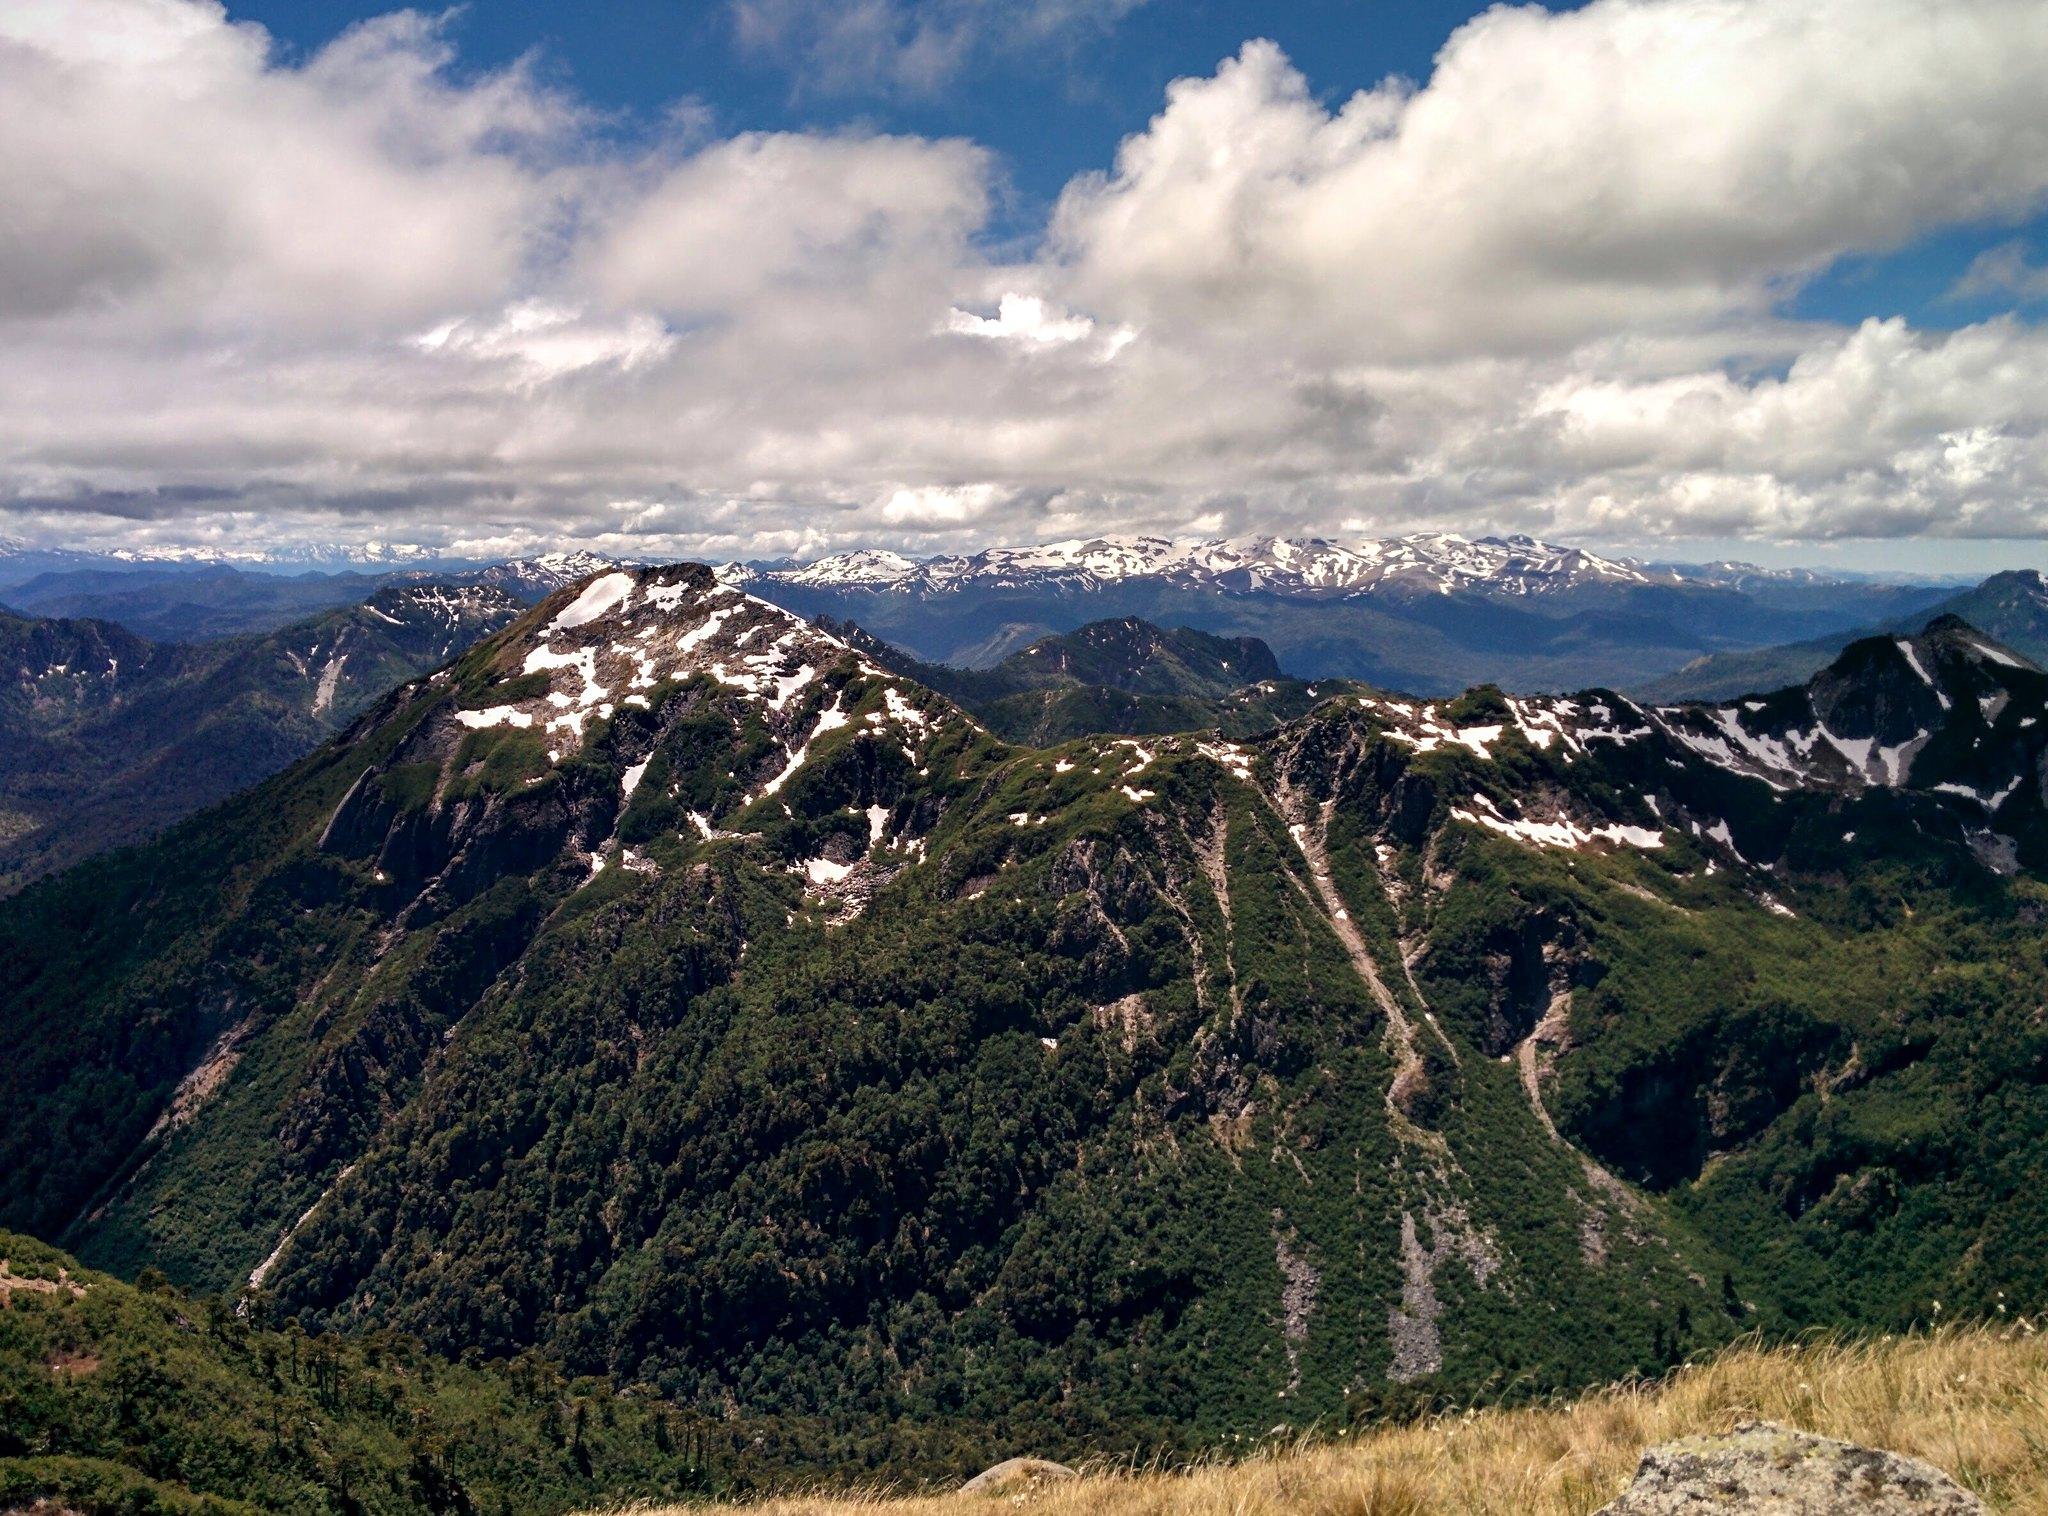 The view east from Cerro San Sebastián